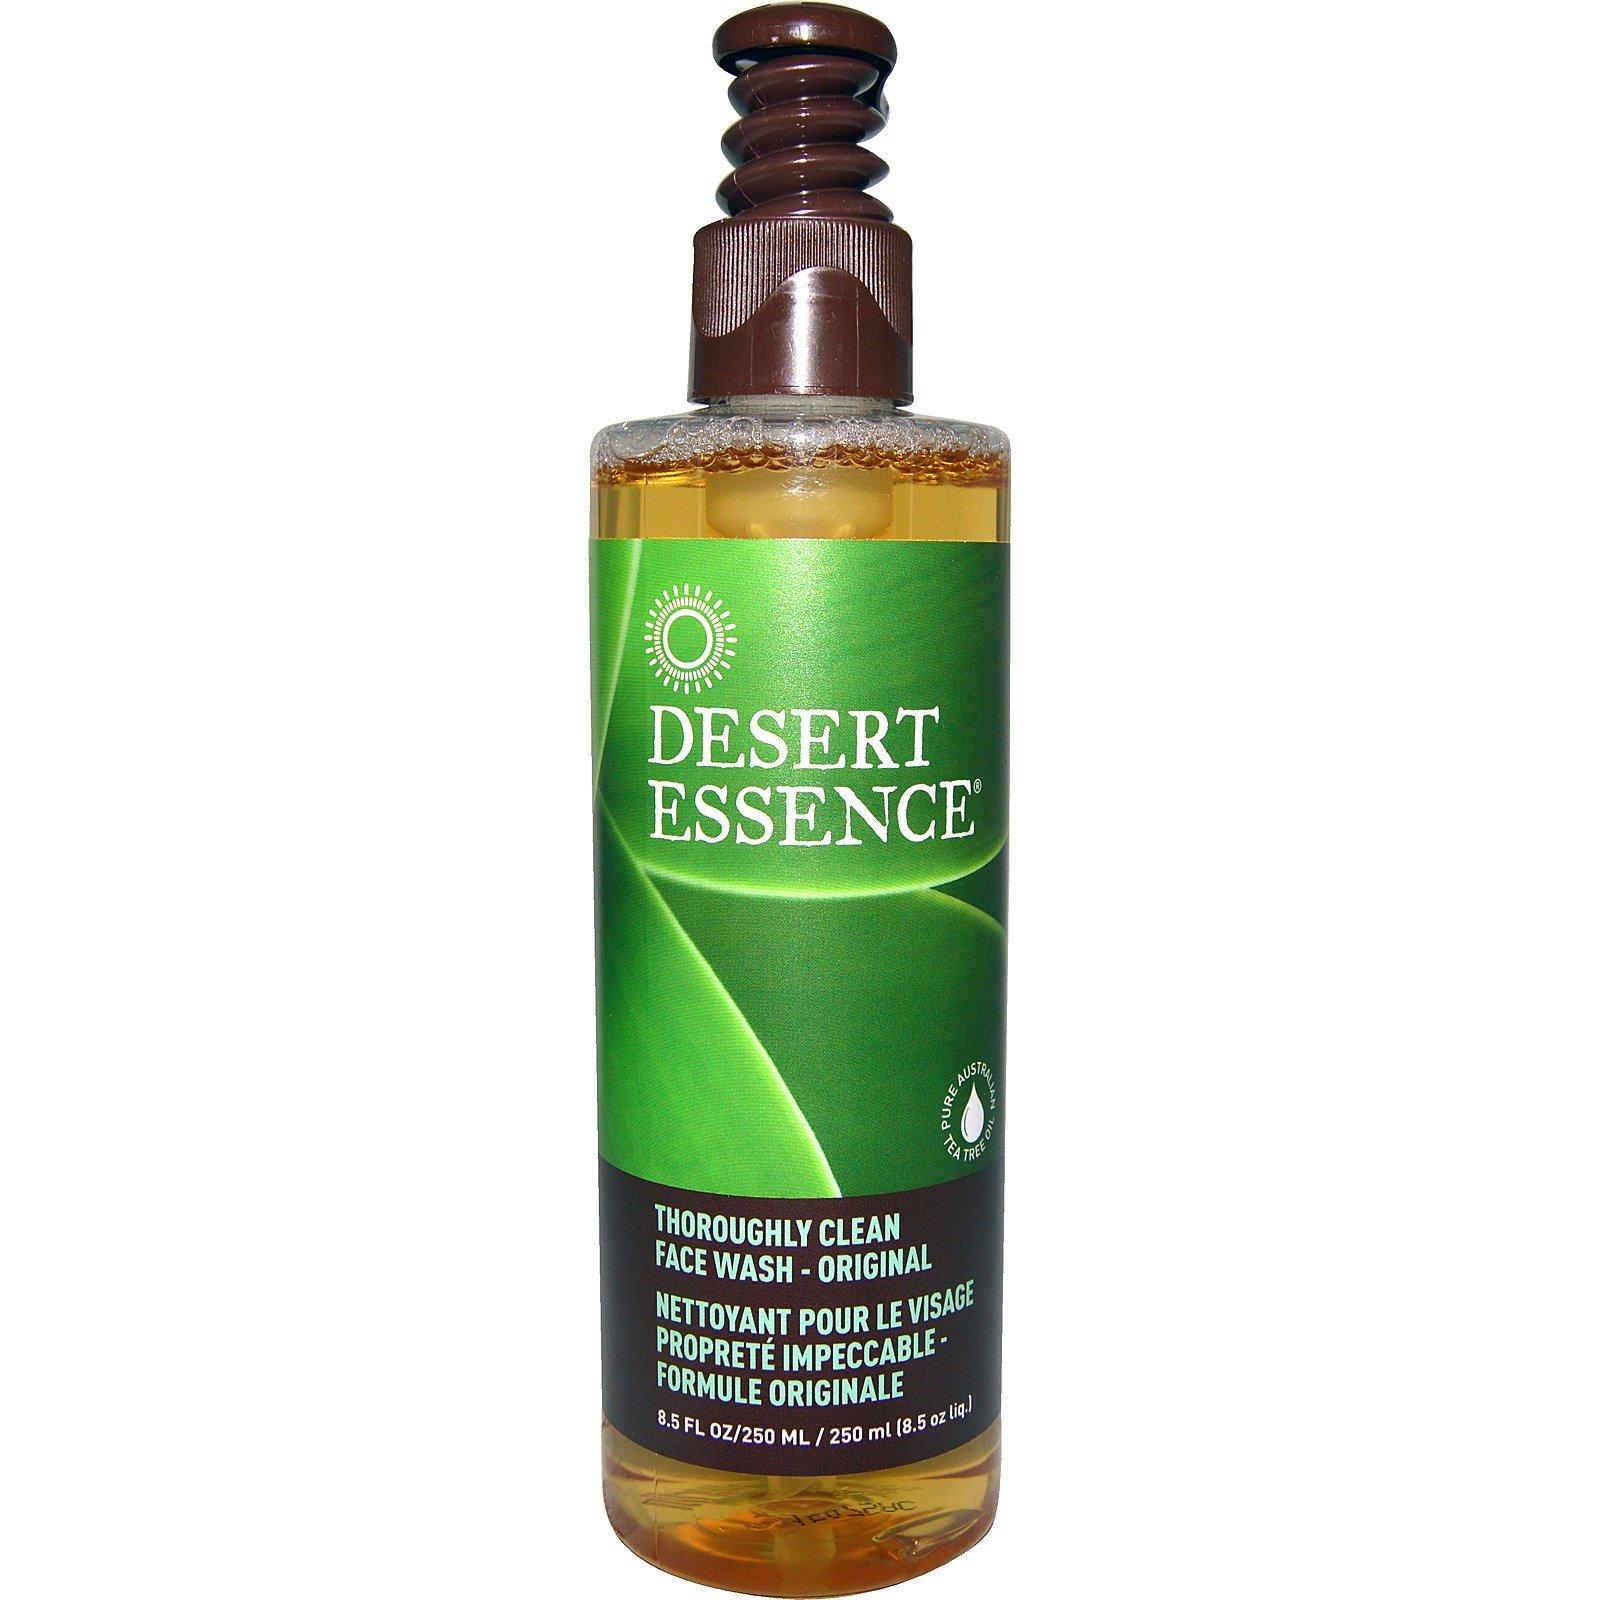 Desert Essence Thoroughly Clean Face Wash Original 8 5